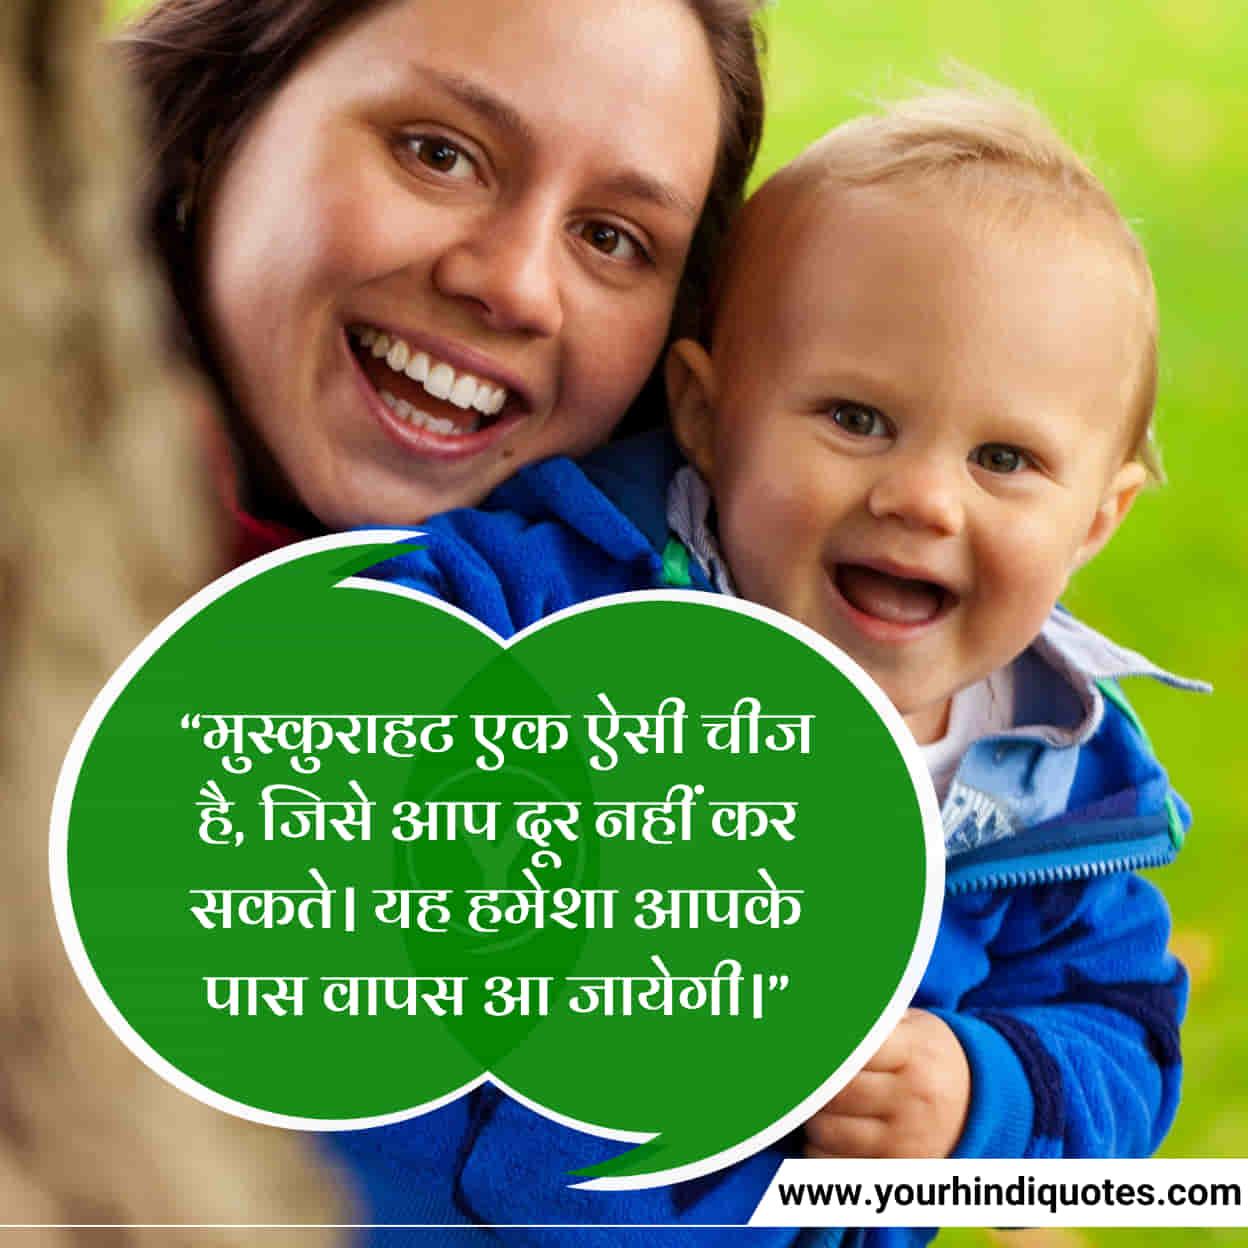 Hindi Beautiful Smile Quotes